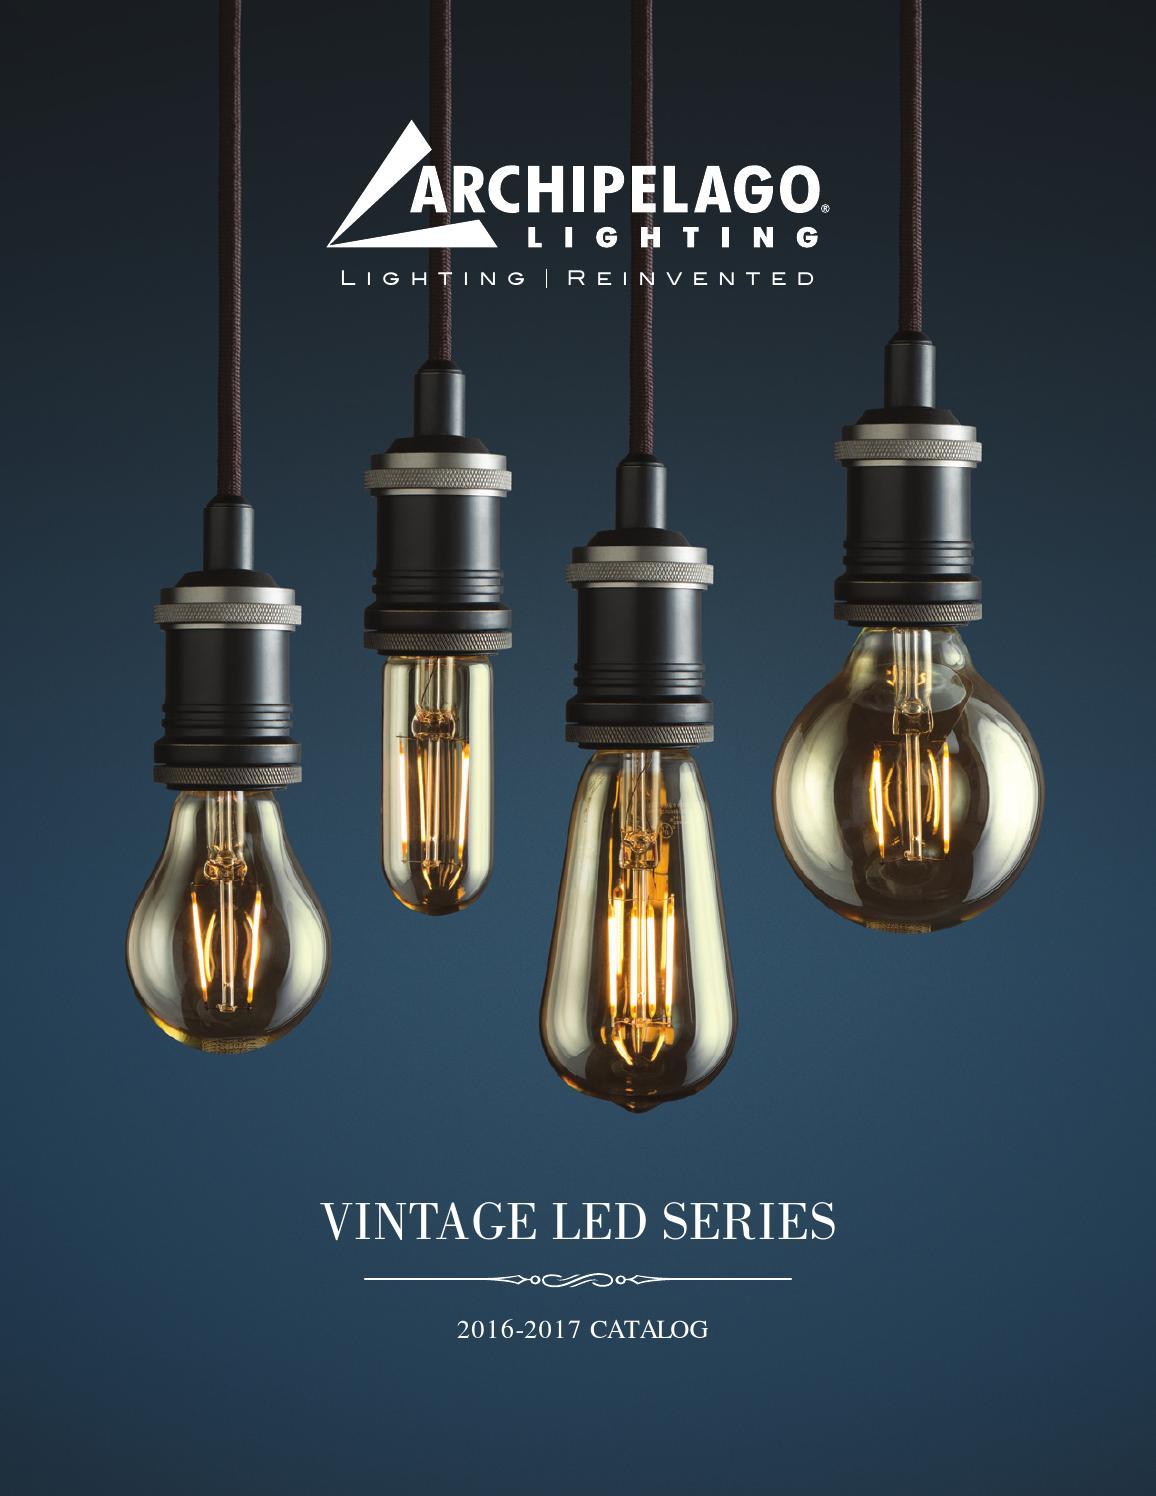 ARCHIPELAGO LIGHTING   Vintage LED Series Catalog by Archipelago Lighting - issuu & ARCHIPELAGO LIGHTING   Vintage LED Series Catalog by Archipelago ... azcodes.com